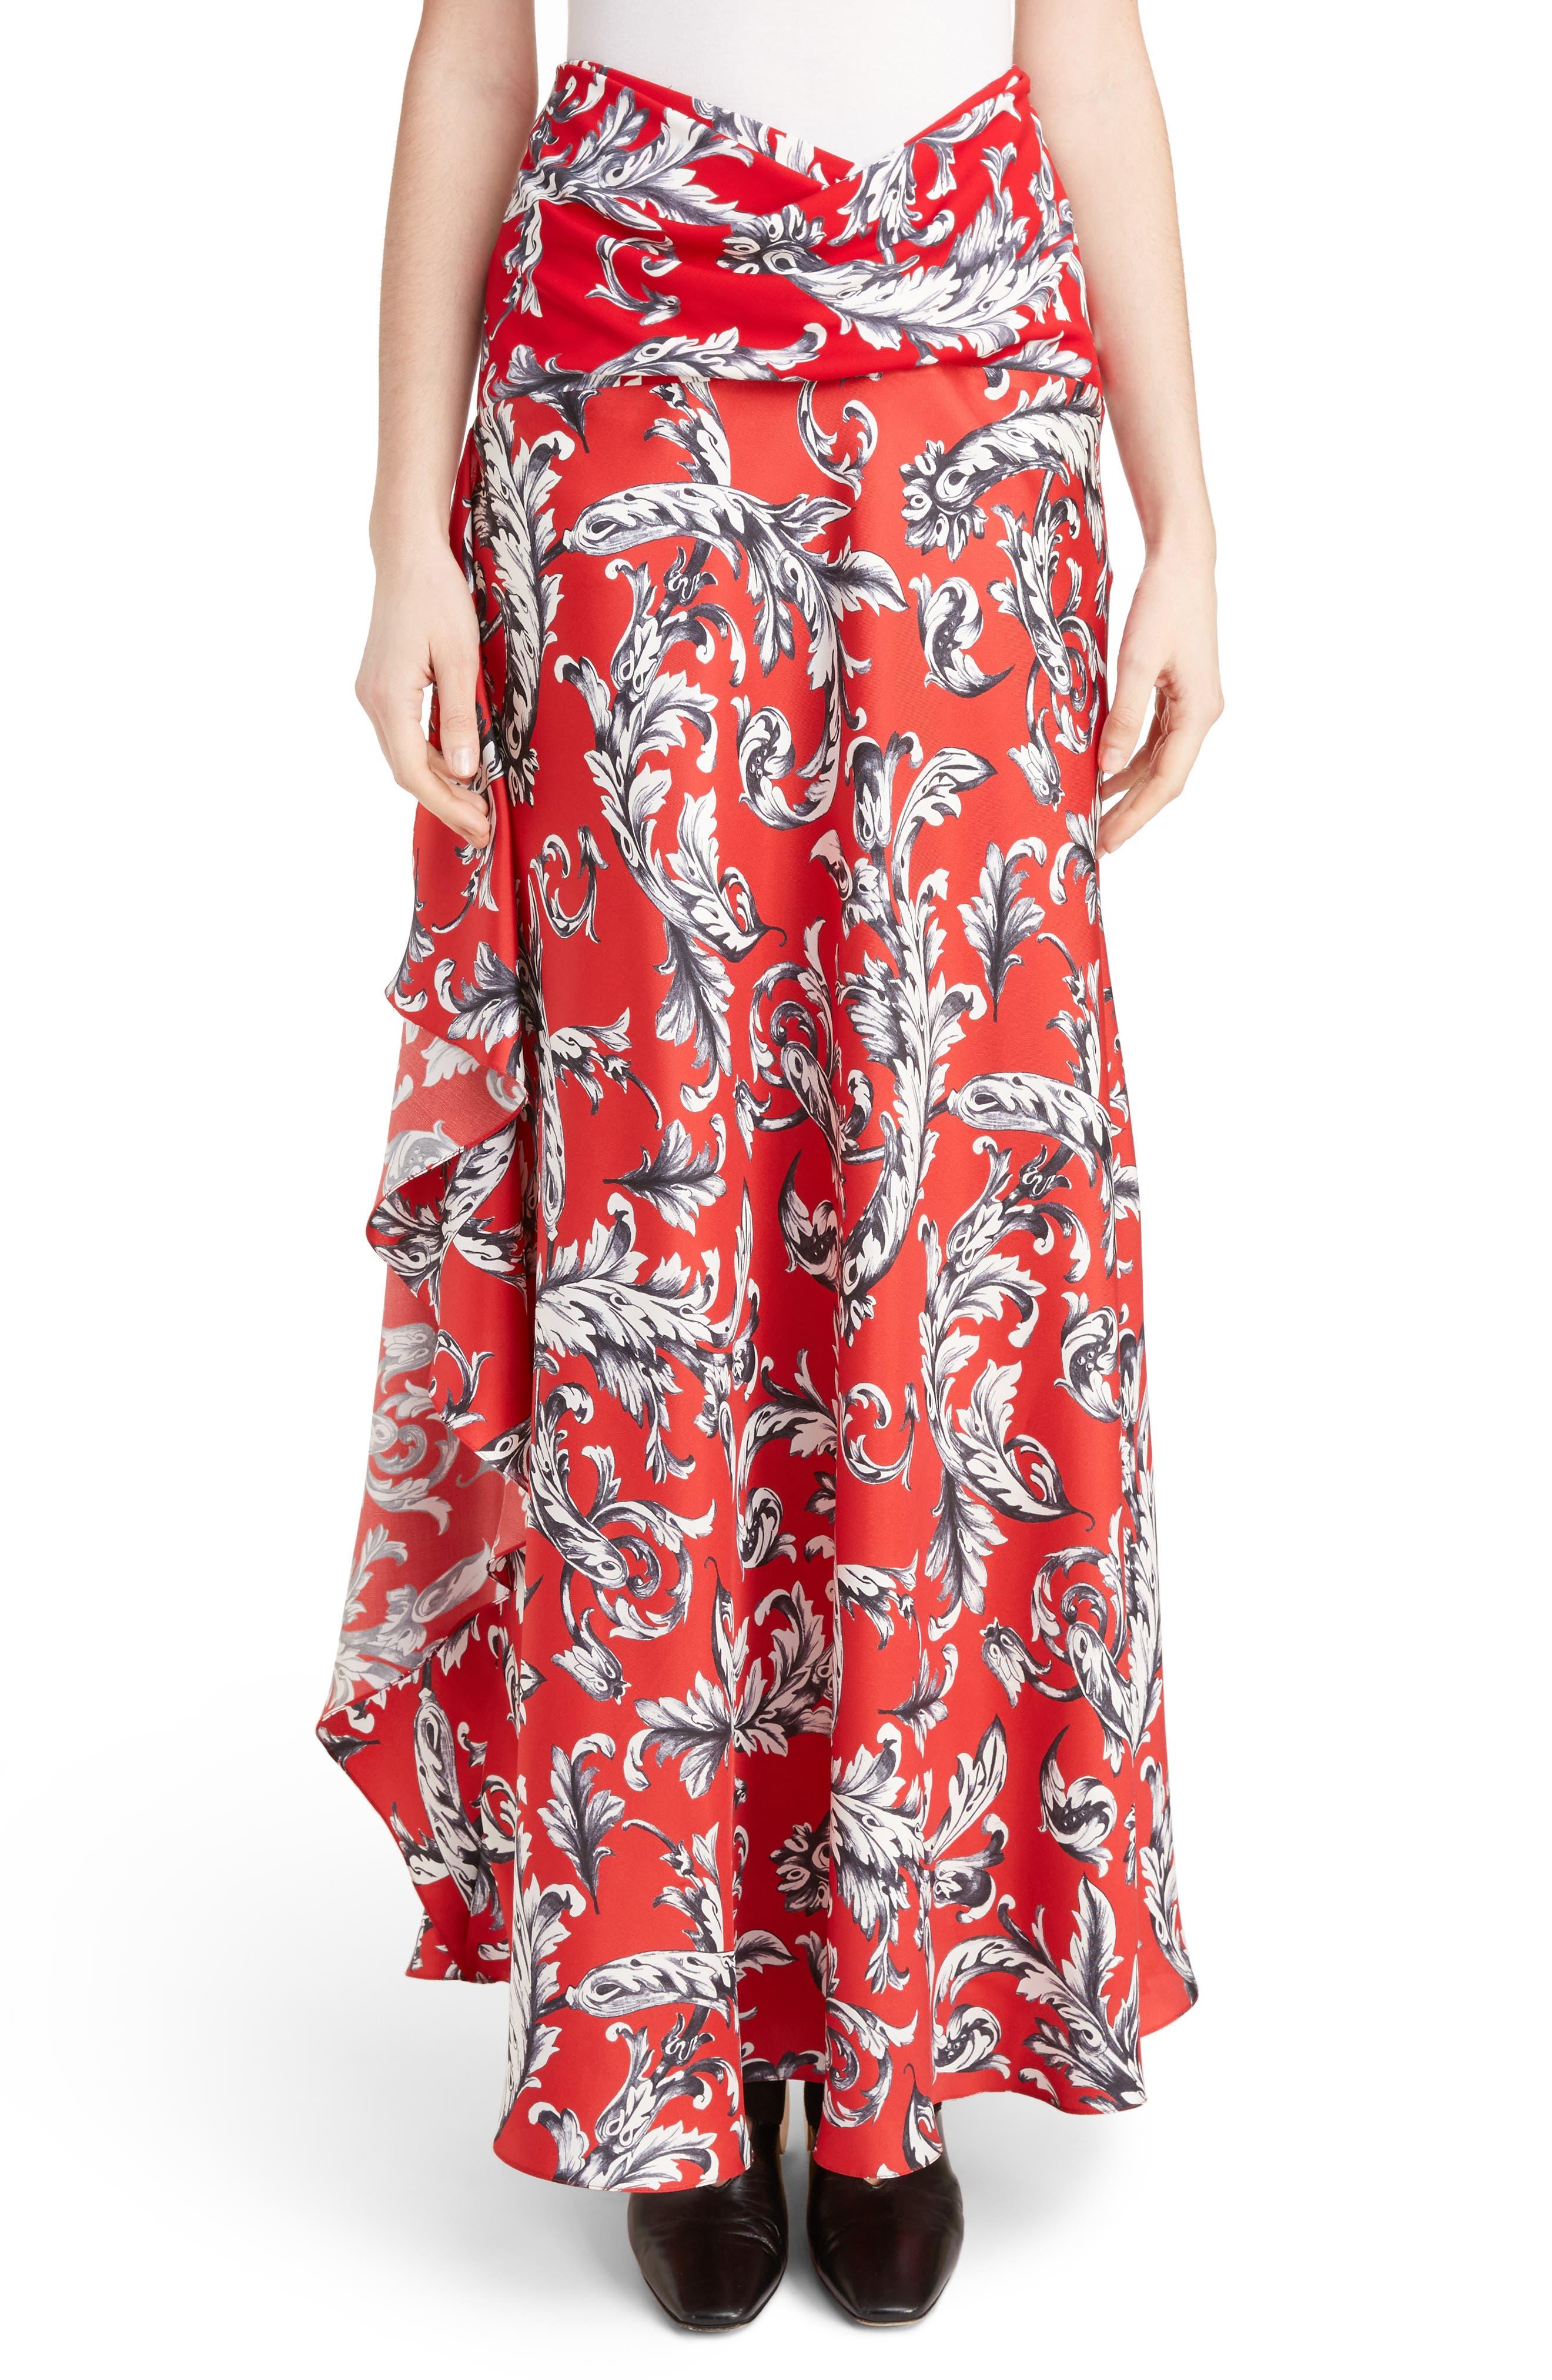 Alternate Image 1 Selected - J.W.ANDERSON Filigree Print Asymmetrical Maxi Skirt